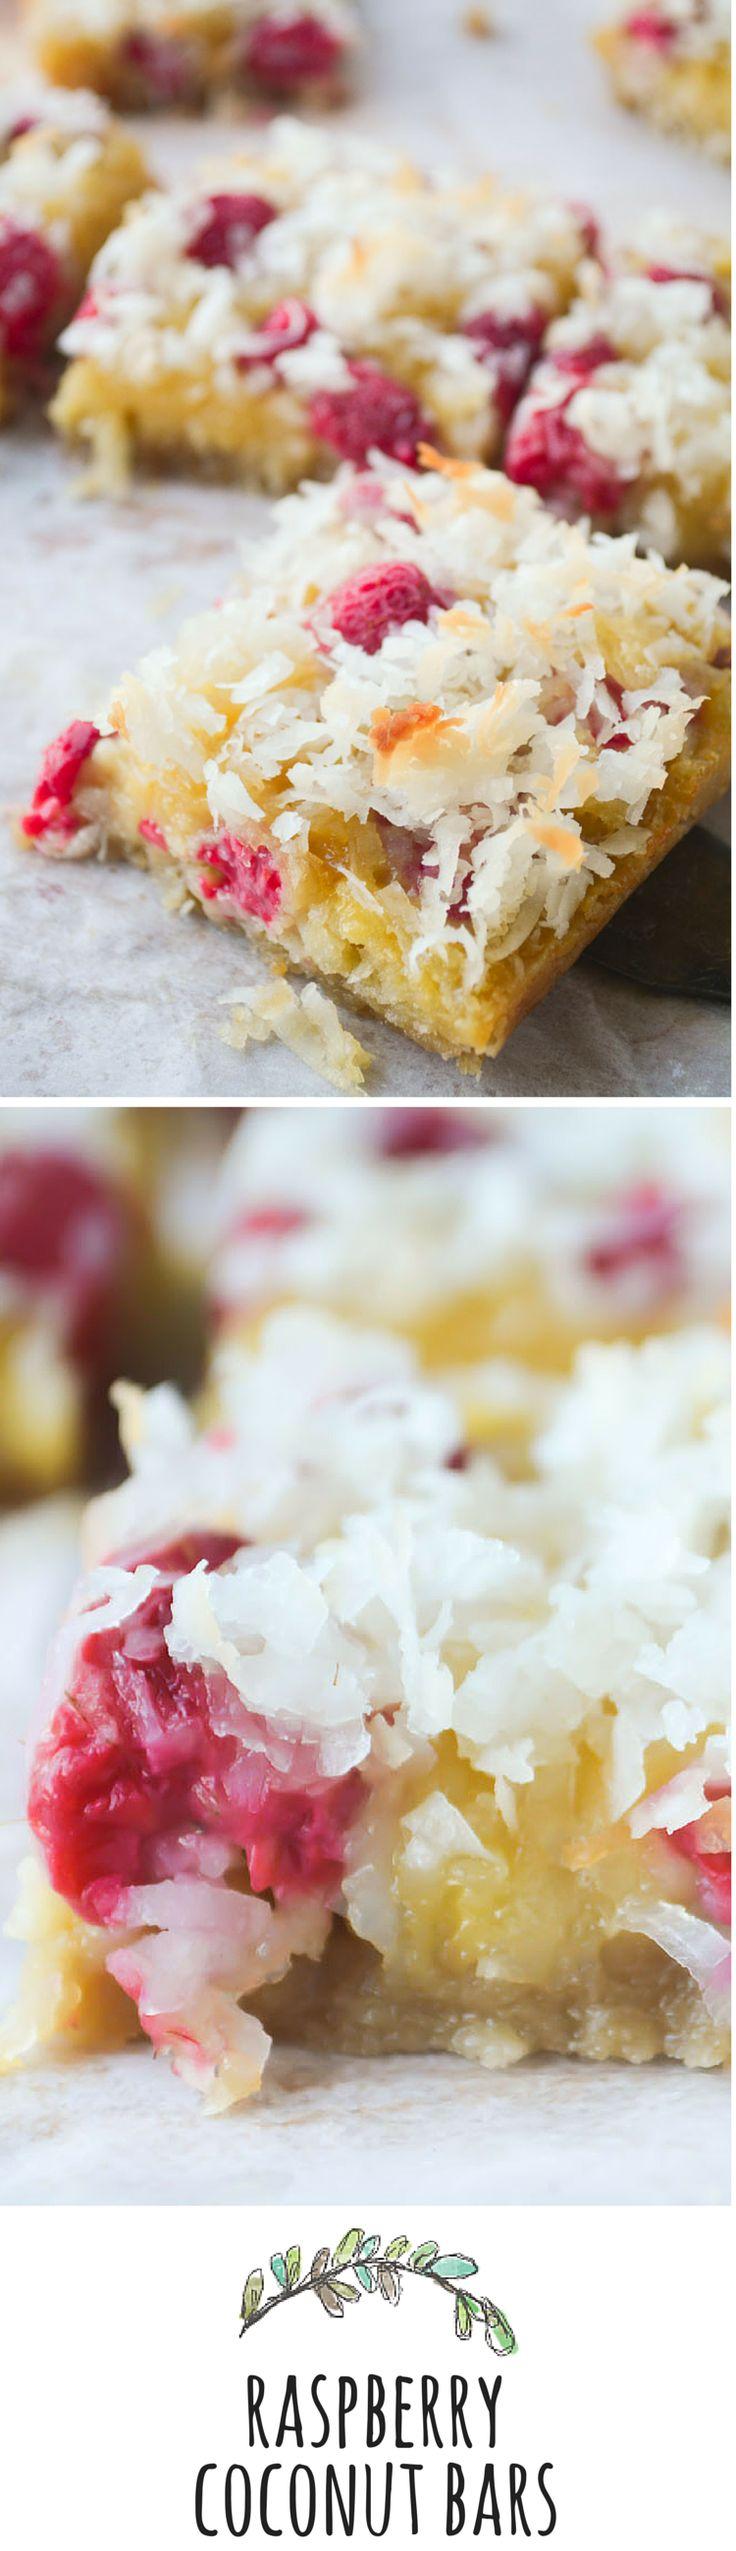 Soft and gooey macaroon bars meet fresh tart raspberries!